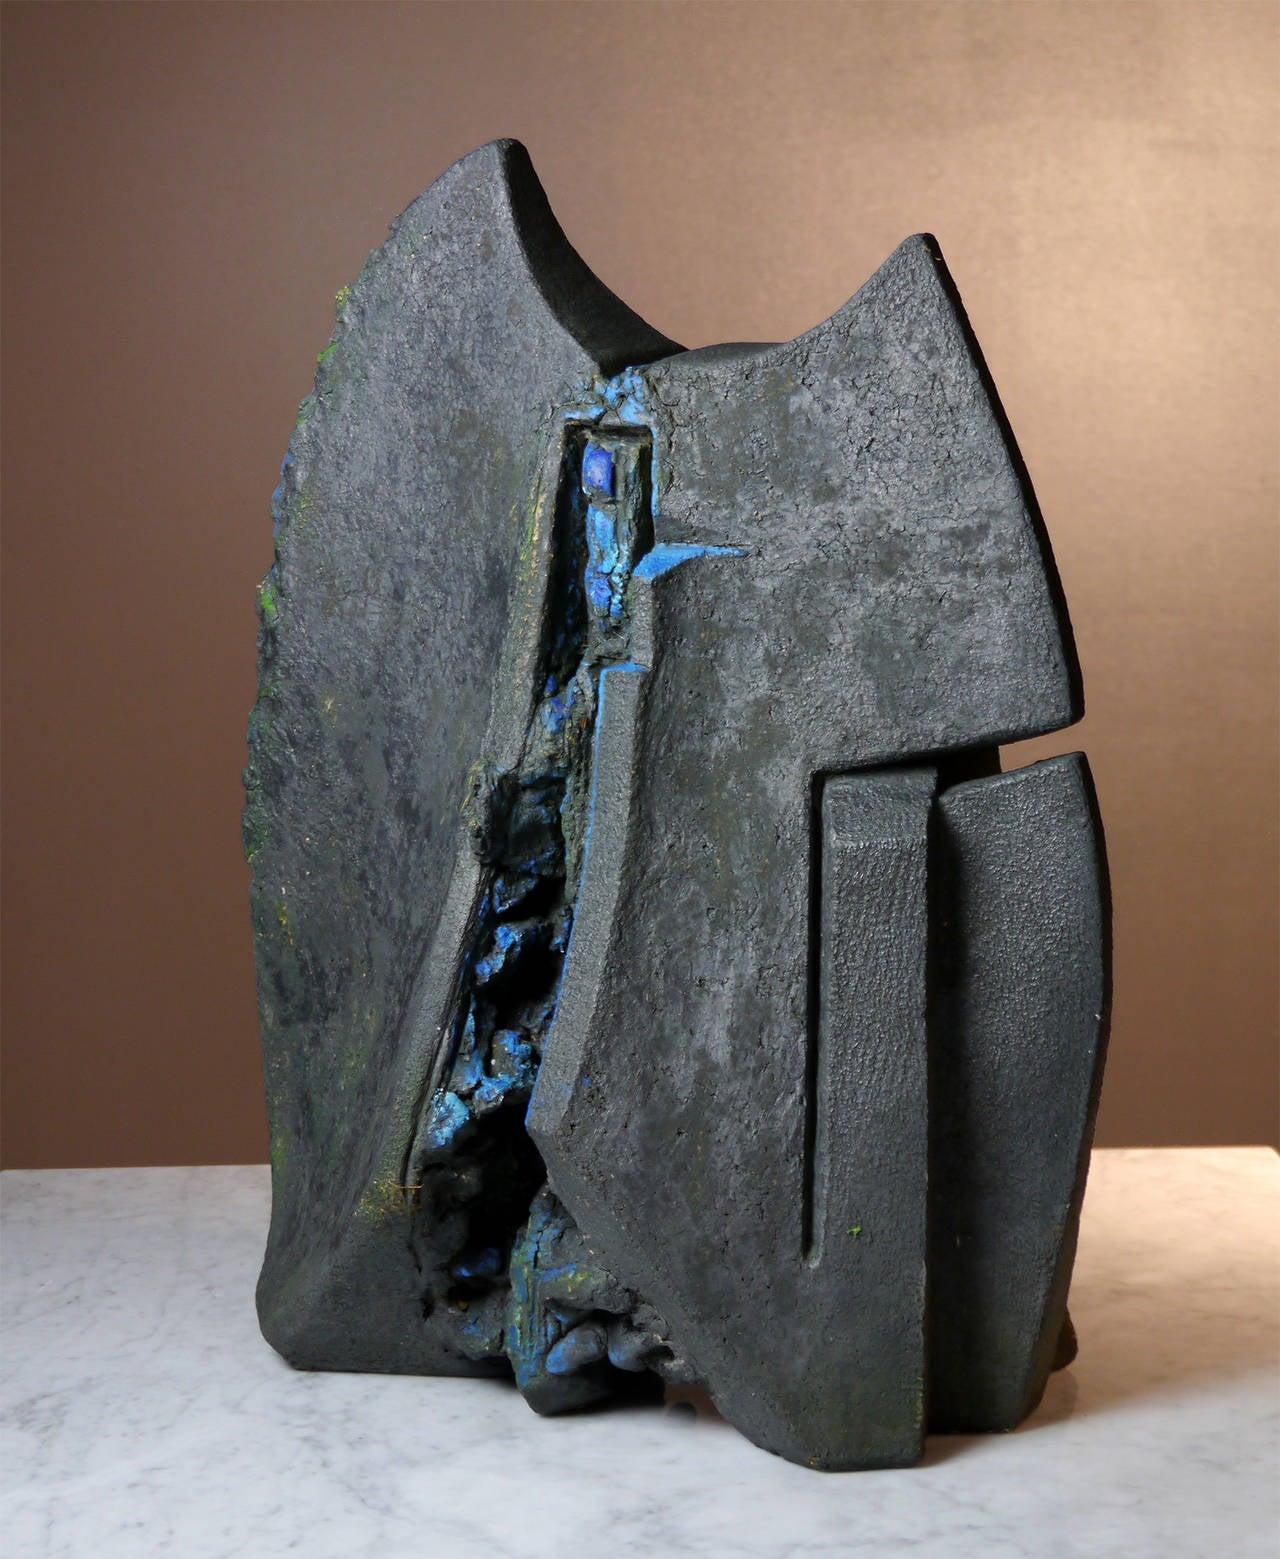 Stoneware Sculpture by Josette Barbier, 1990 2